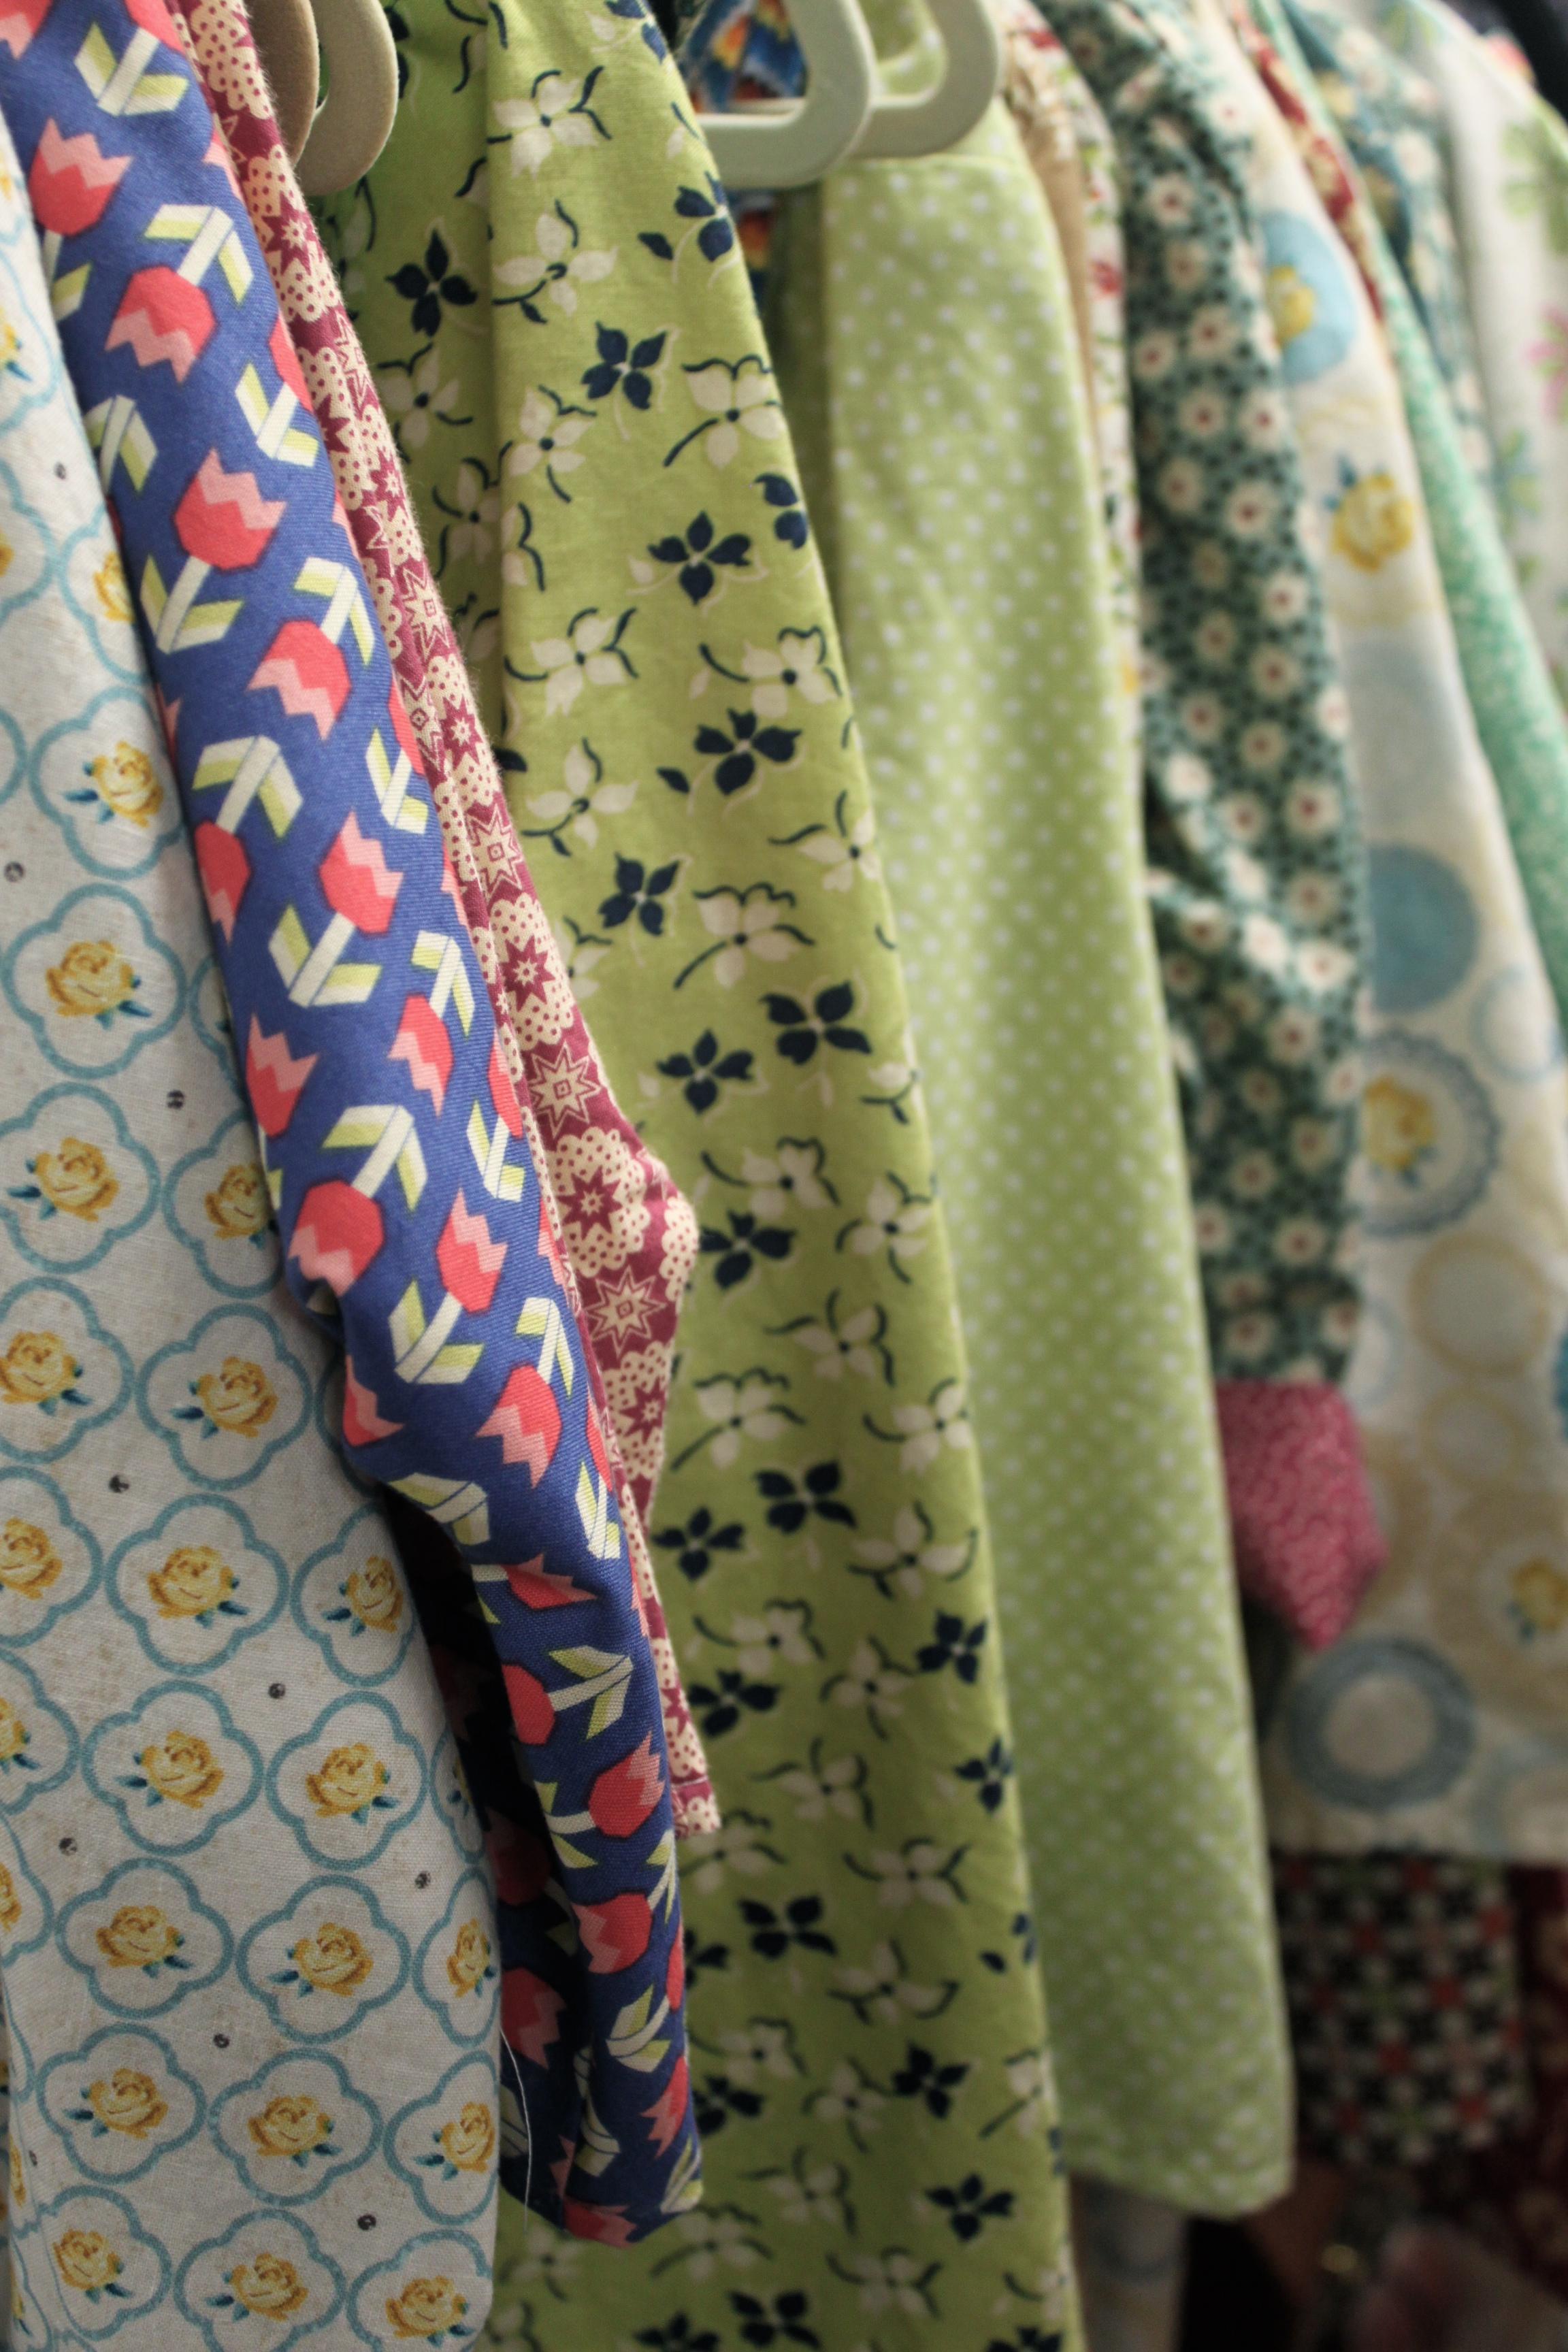 Awesome fabrics found nowhere else.